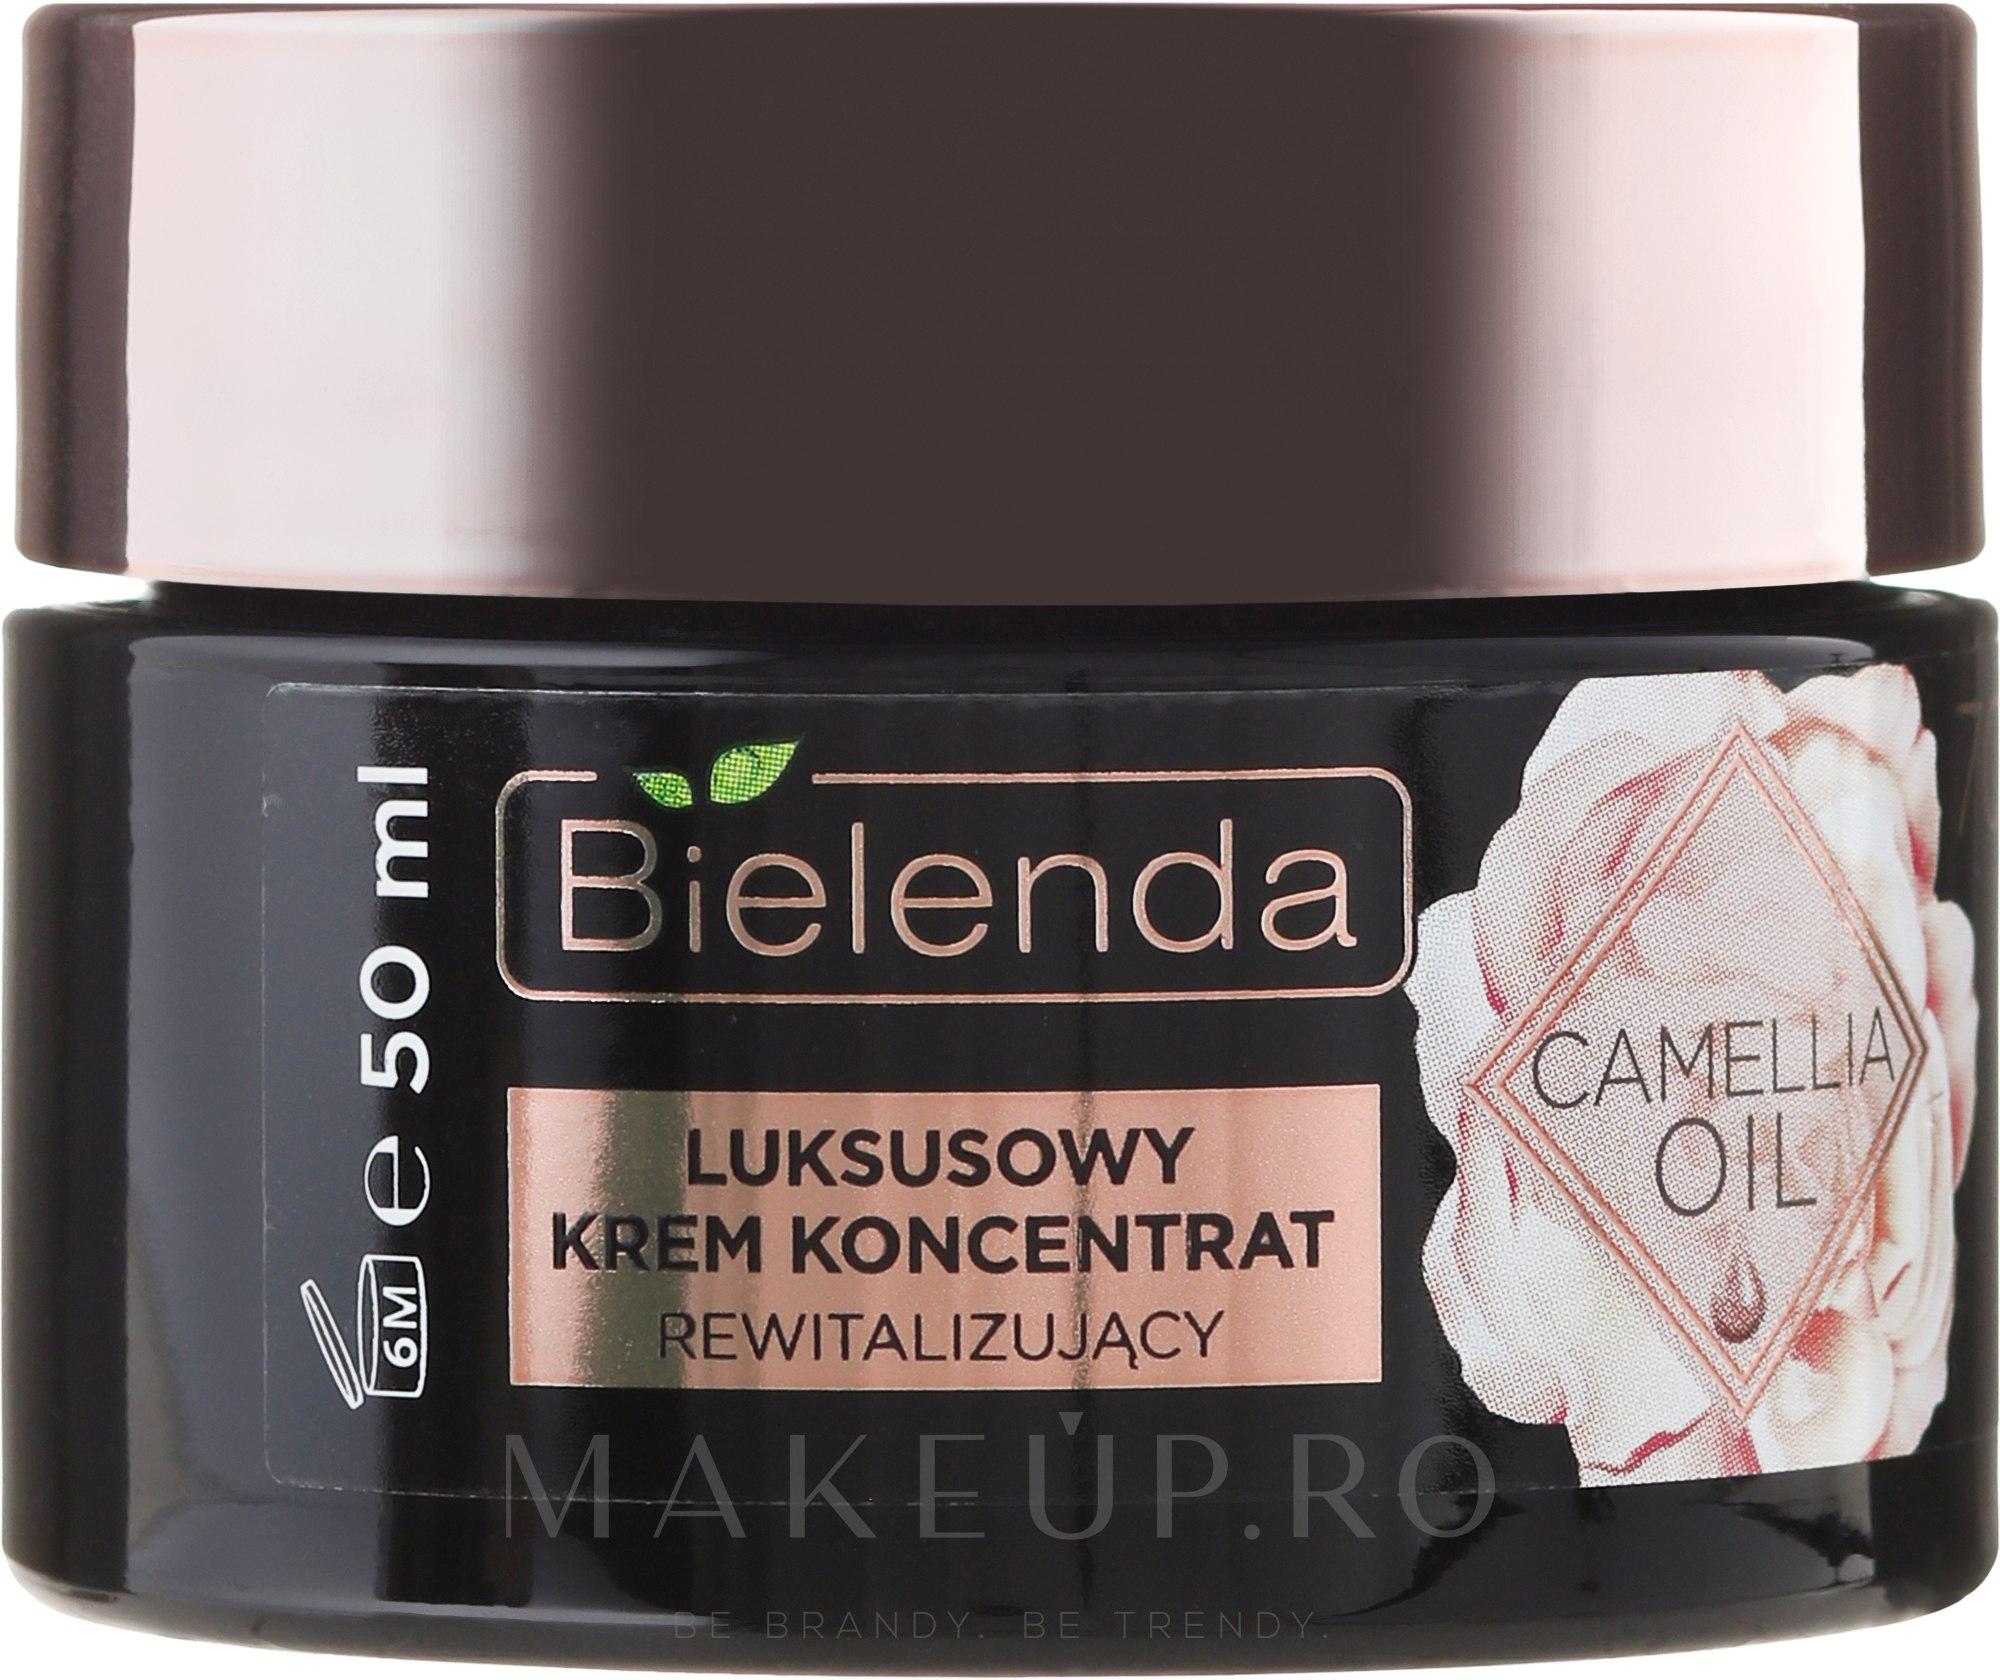 Cremă-lifting cu efect antirid 70+ - Bielenda Camellia Oil Luxurious Cream 70+ — Imagine 50 ml